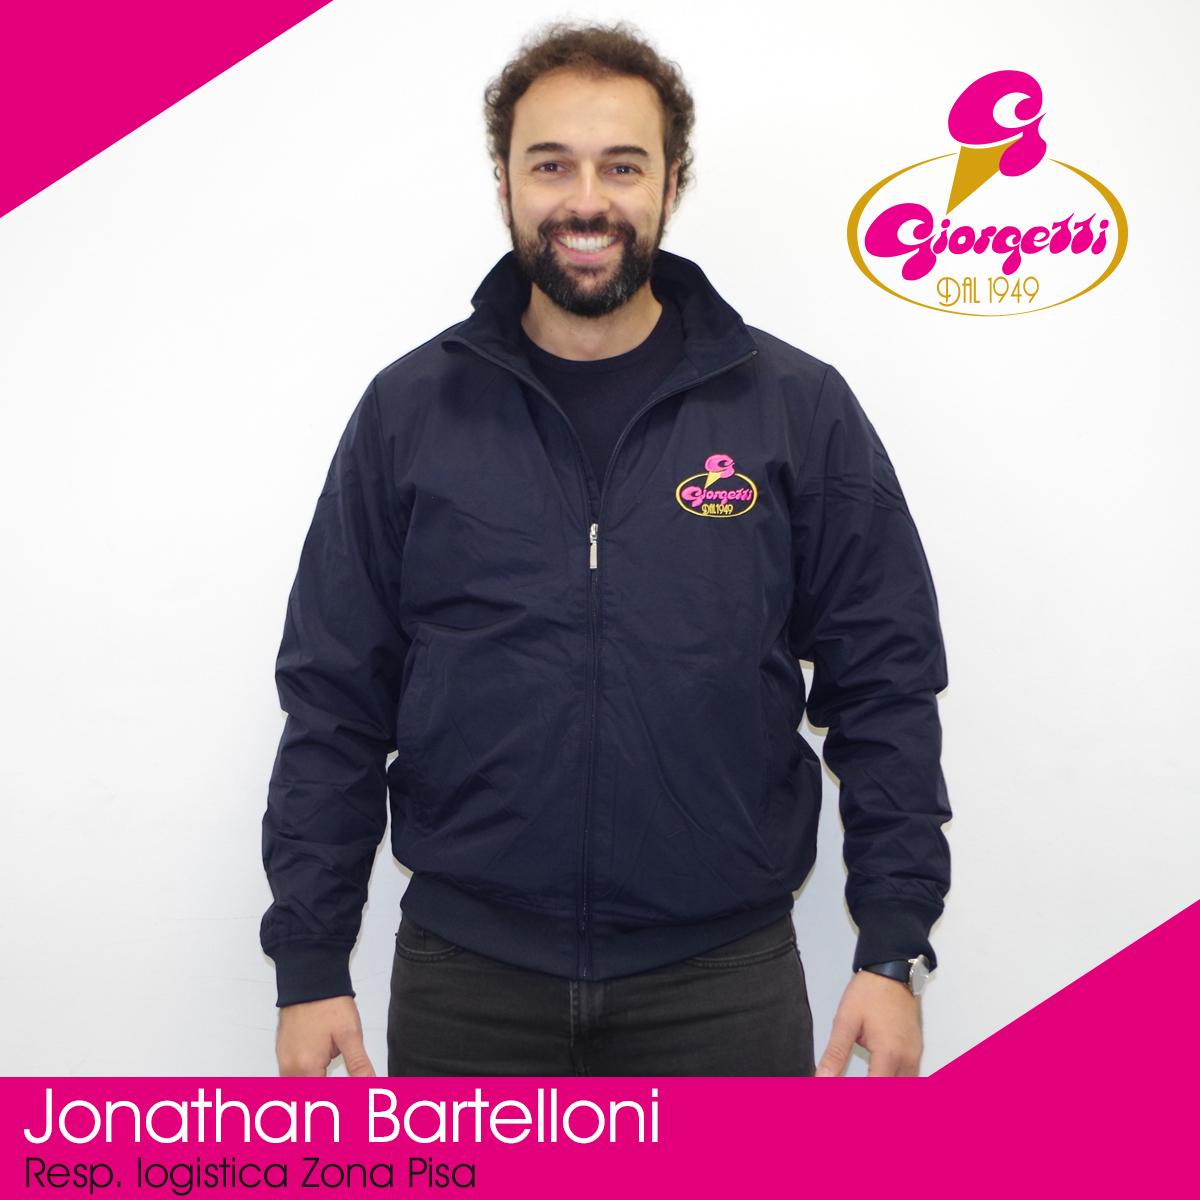 Jonathan Bartelloni